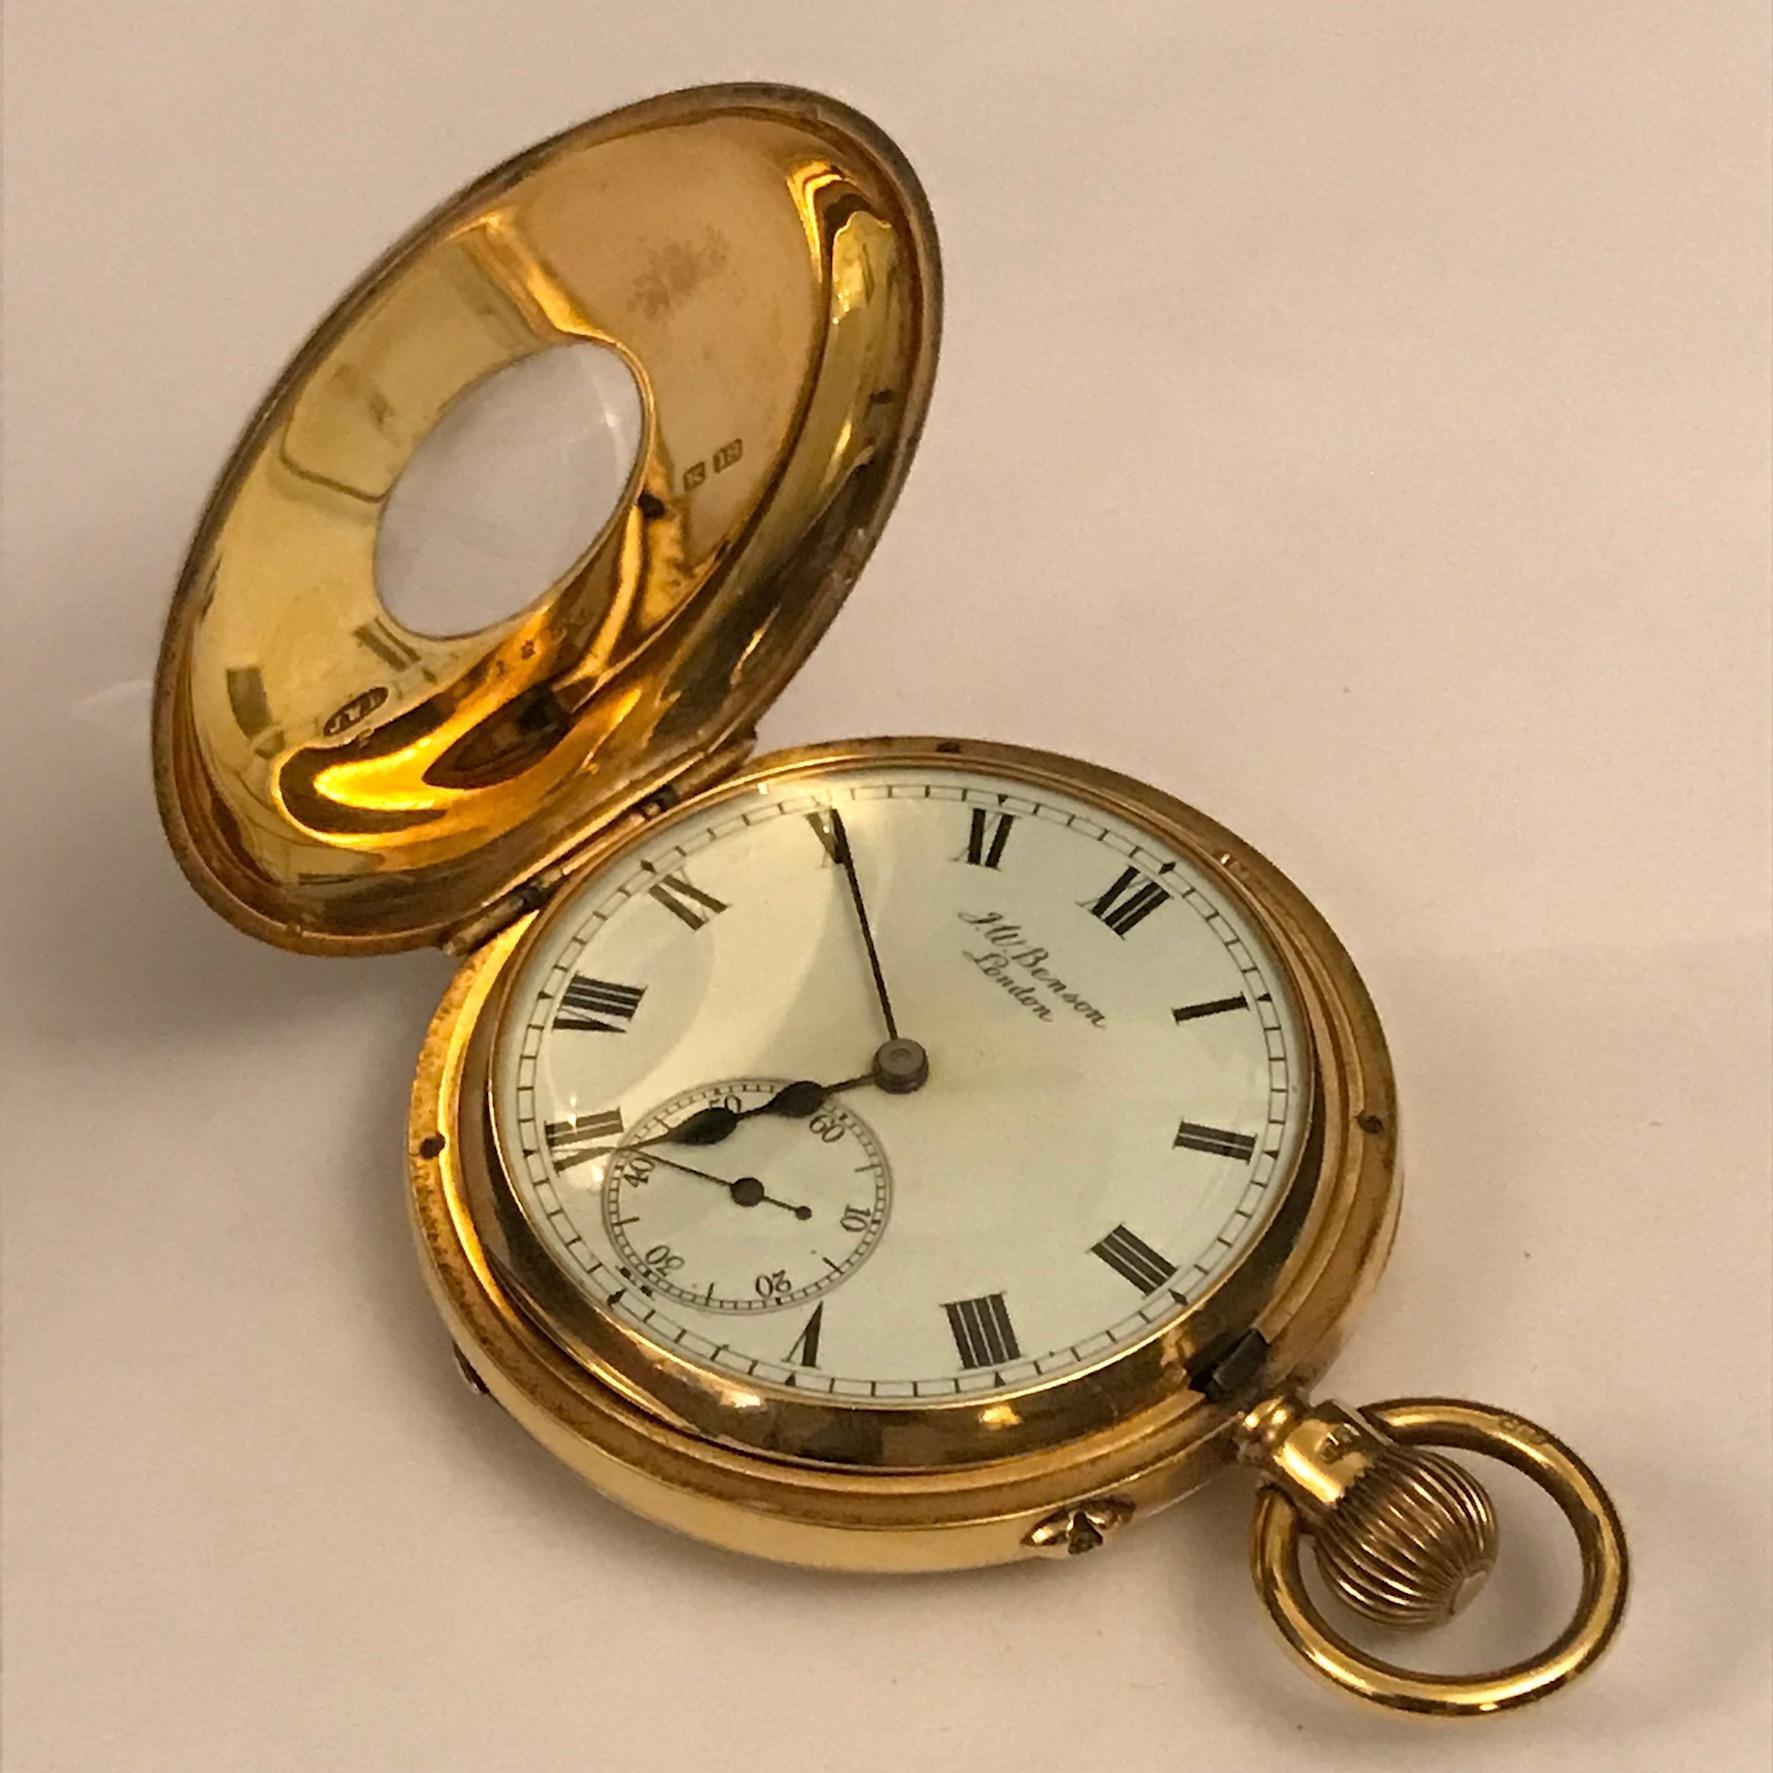 Half Hunter Cased 18ct Gold Pocket Watch - Watches ... | 1773 x 1773 jpeg 239kB